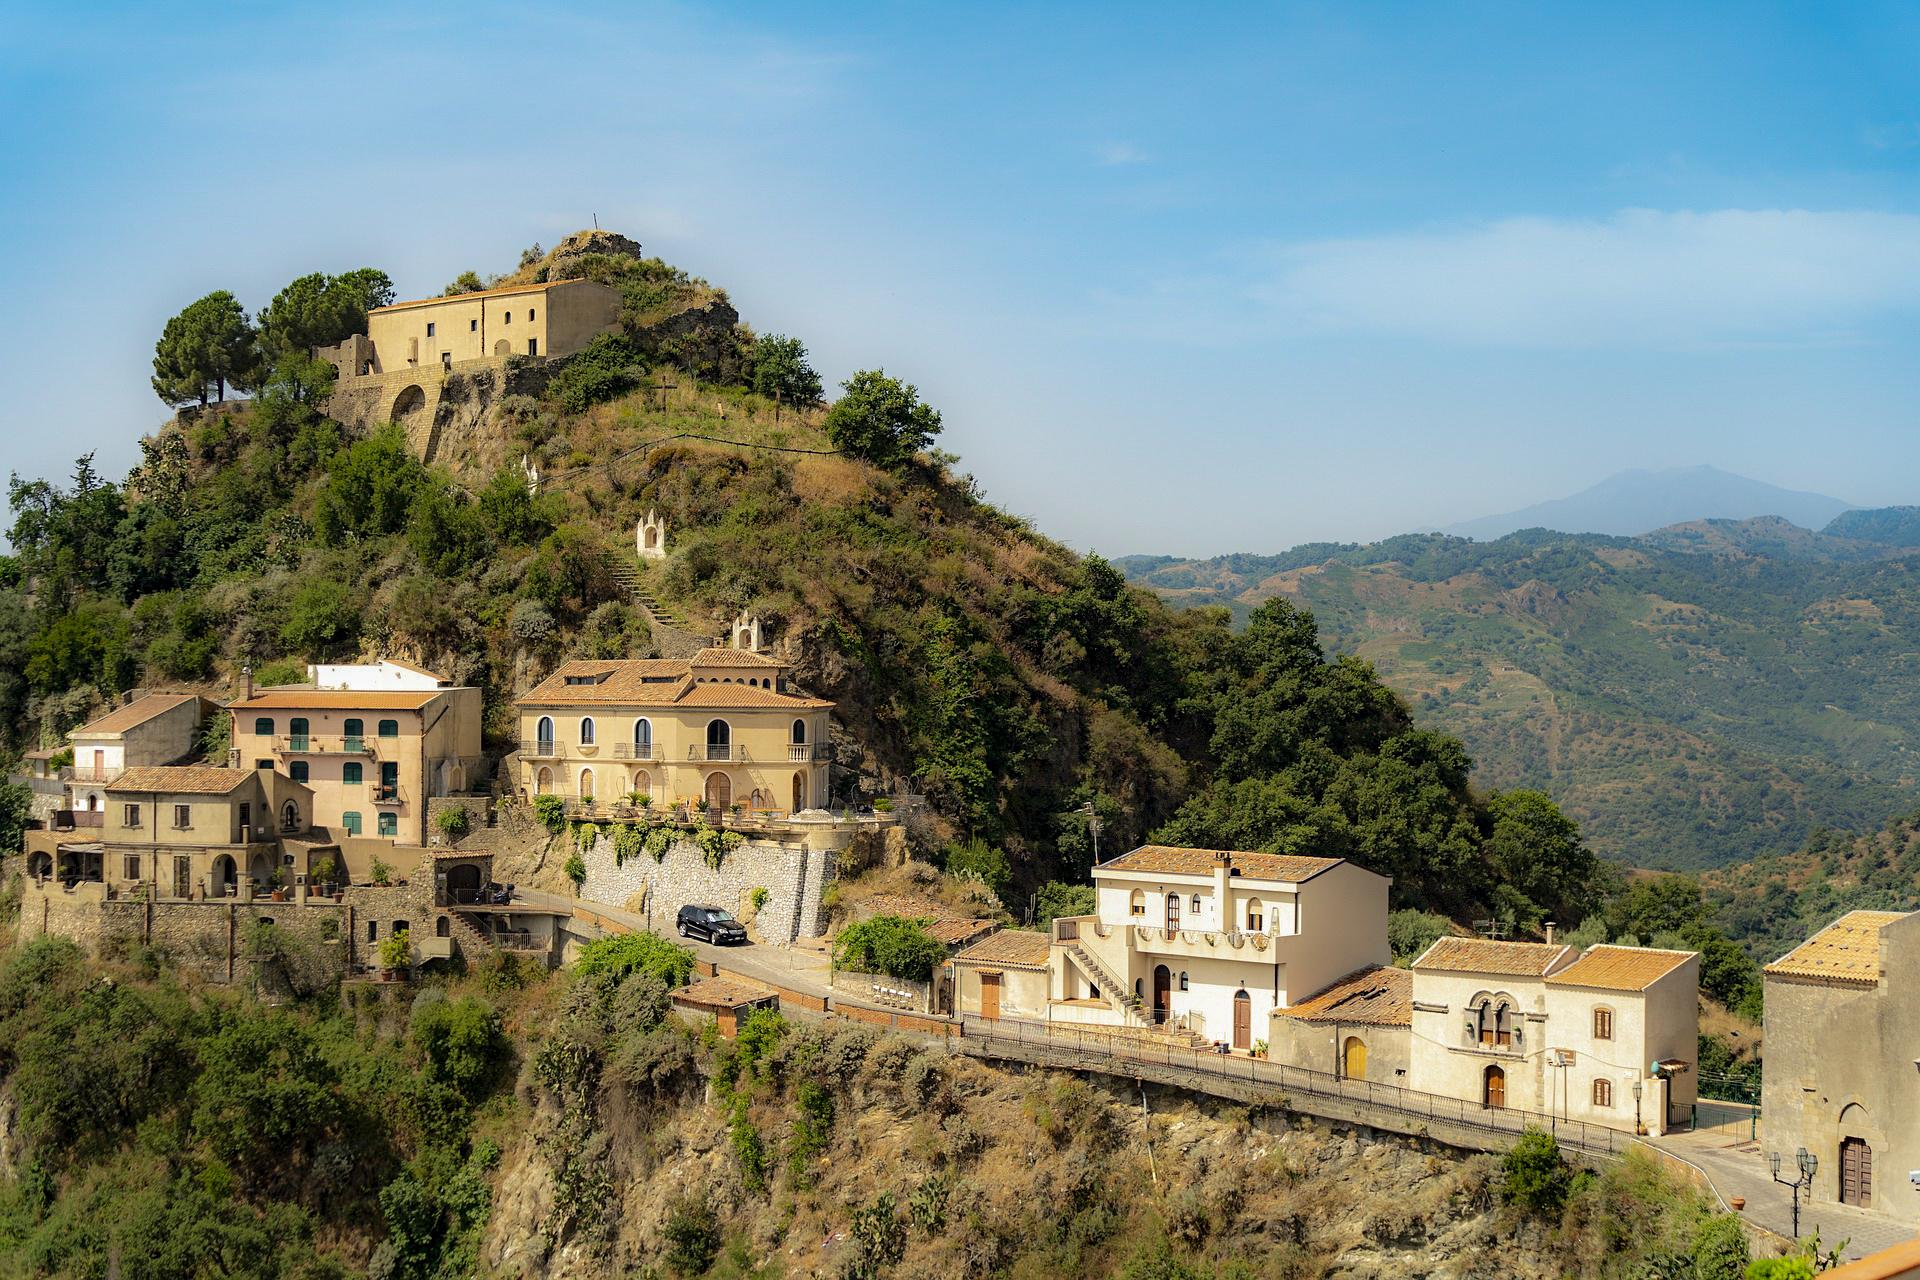 Die Mafia-Stadt Corleone in Sizilien